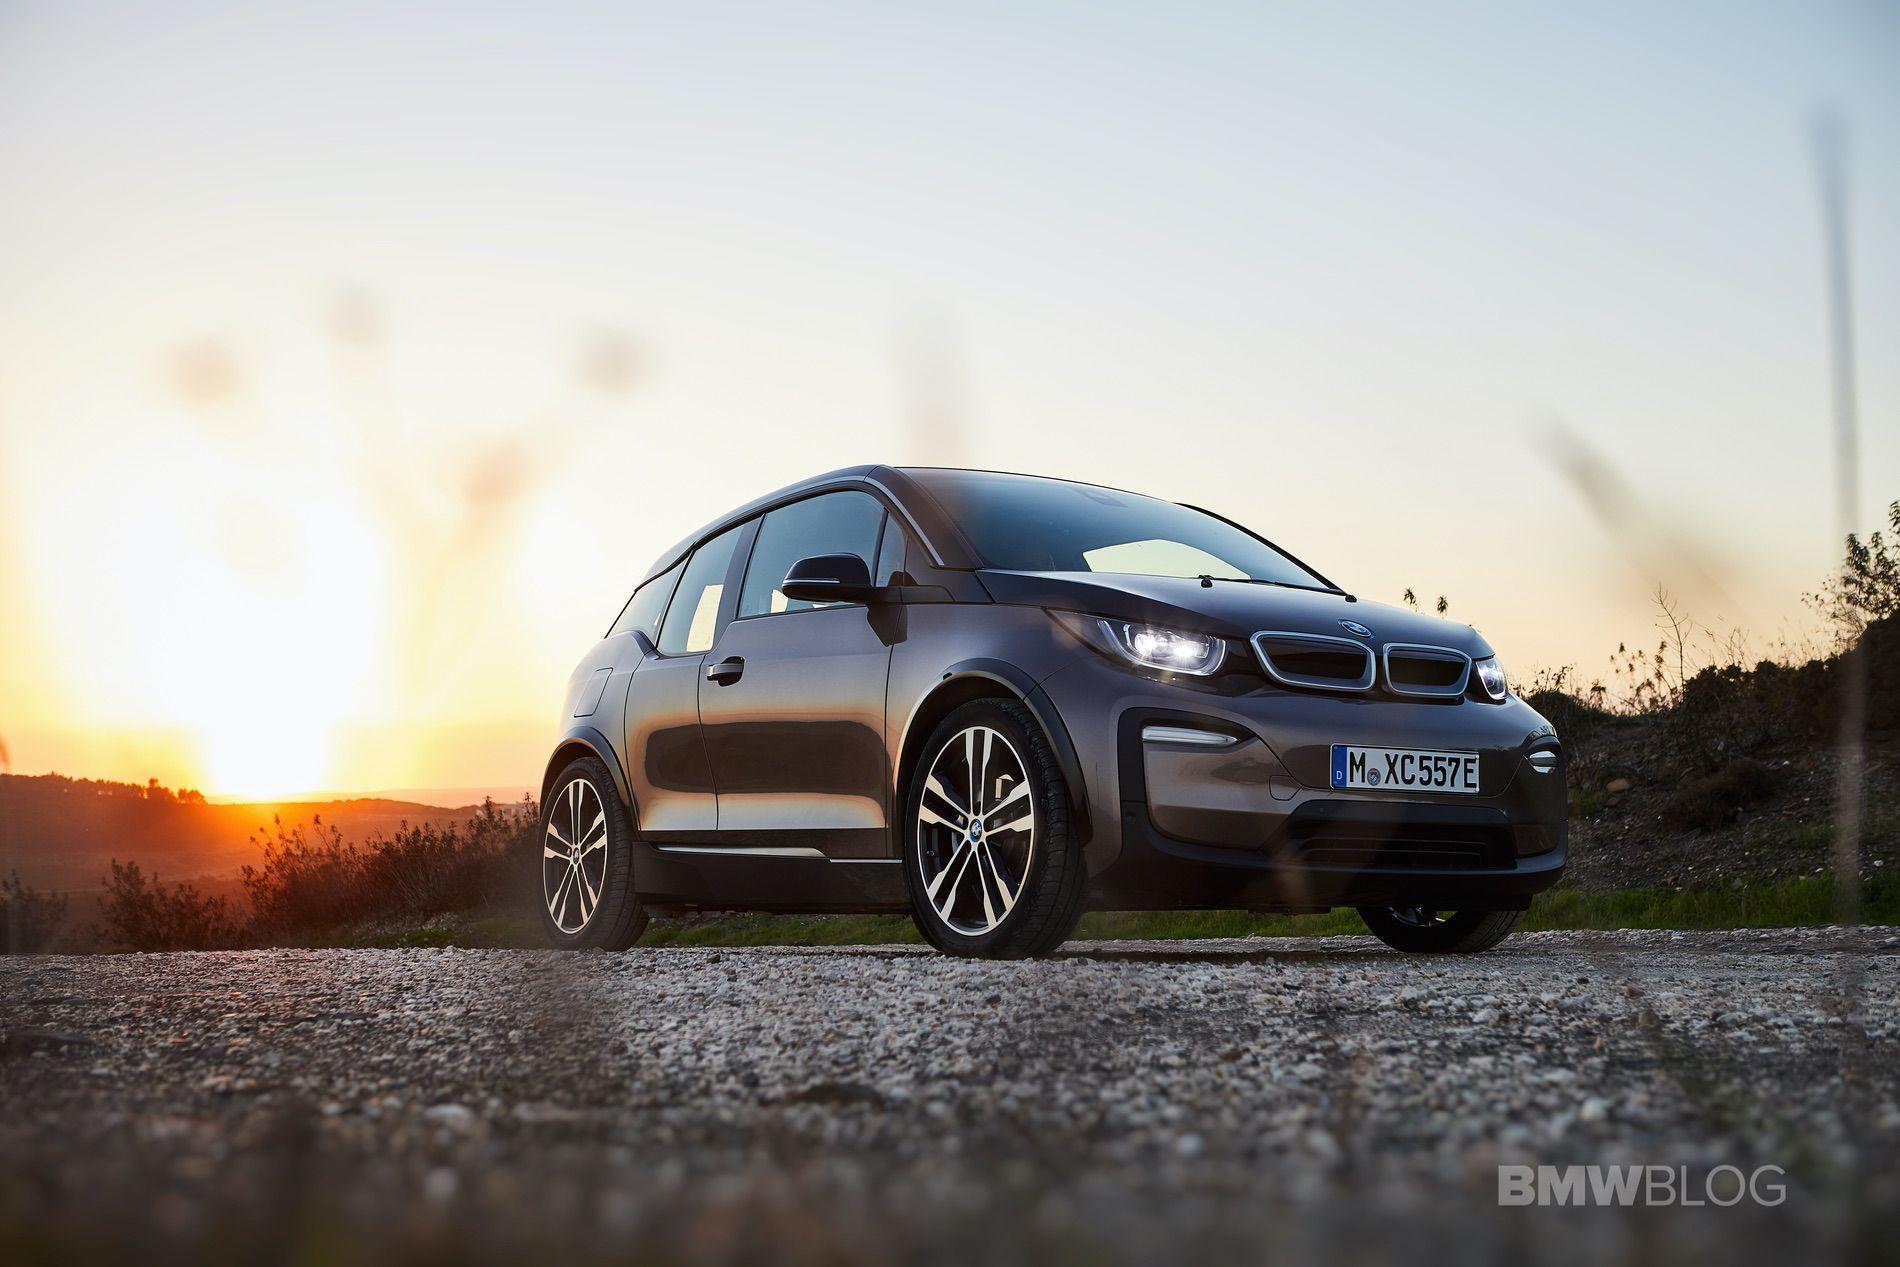 BMW i3 Jucaro Beige Metallic 15